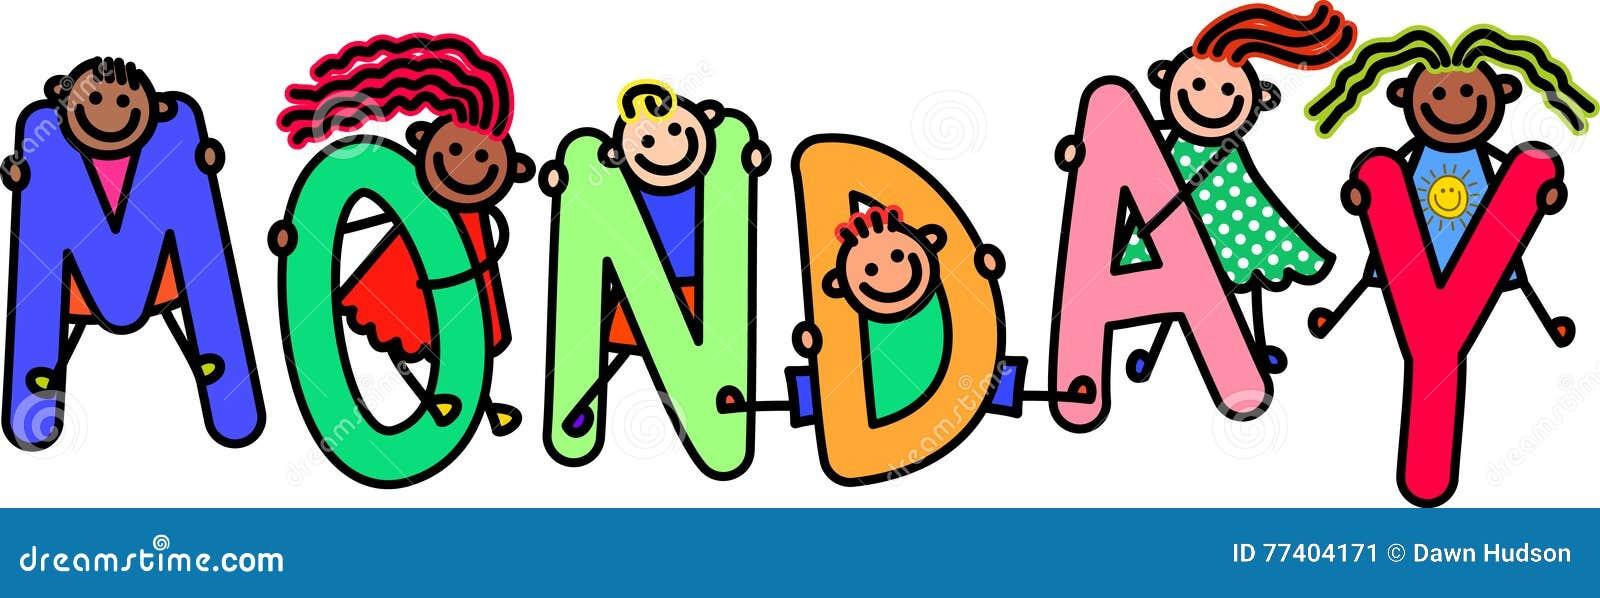 monday kids stock illustration illustration of days